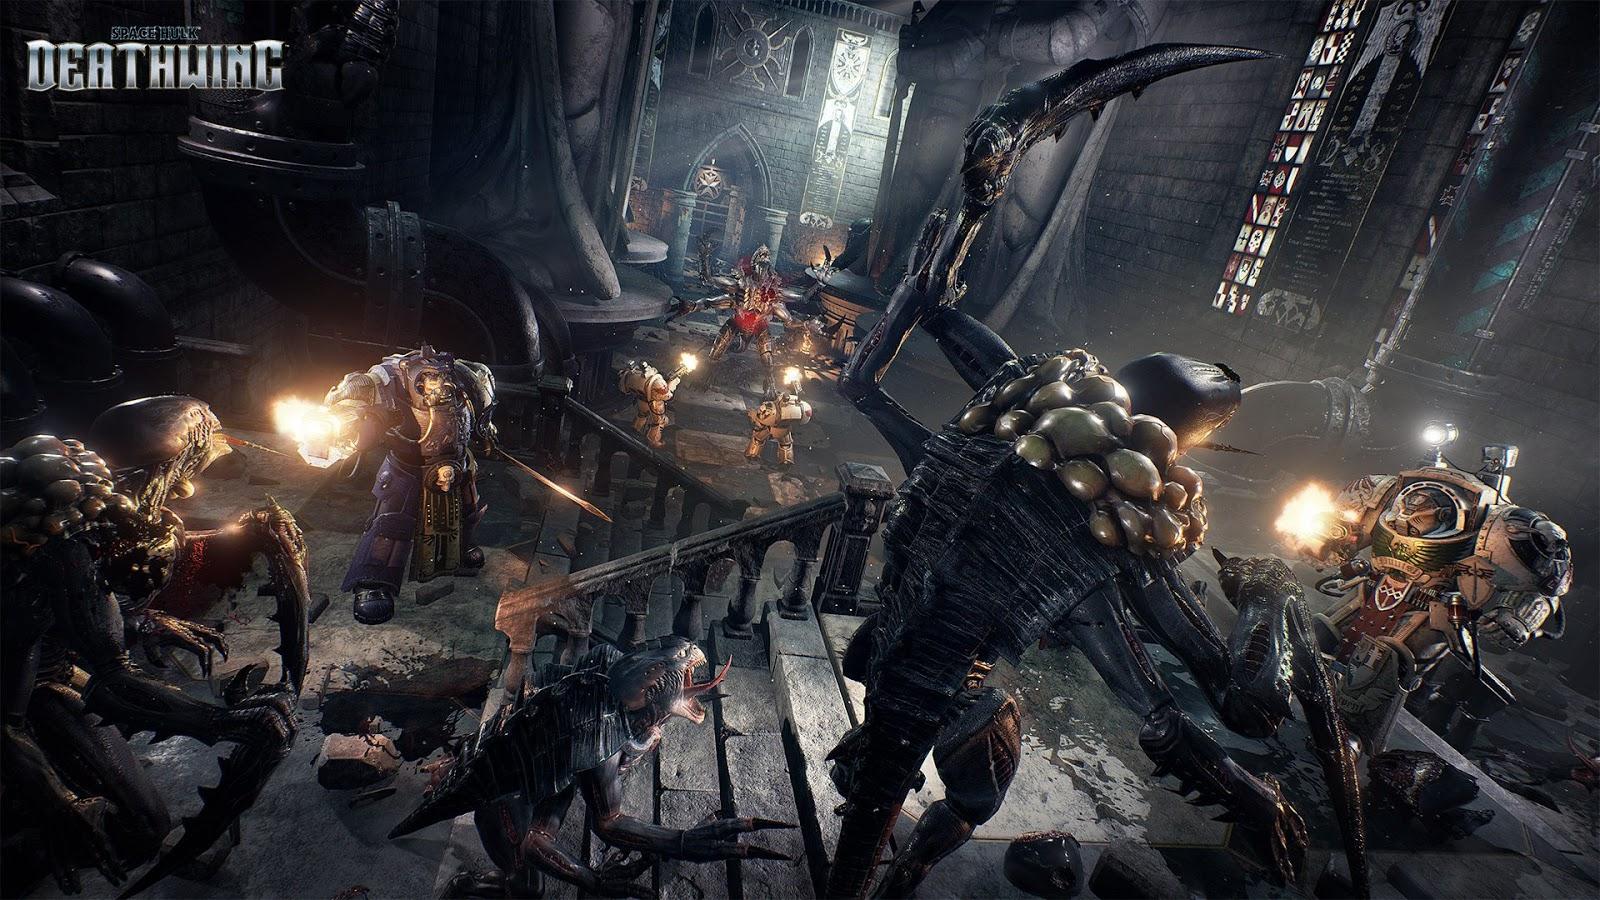 Focus Home Interactive, Space Hulk Deathwing, Space Hulk - Deathwing, Warhammer 40000, Unreal Engine 4, FPS, SciFi